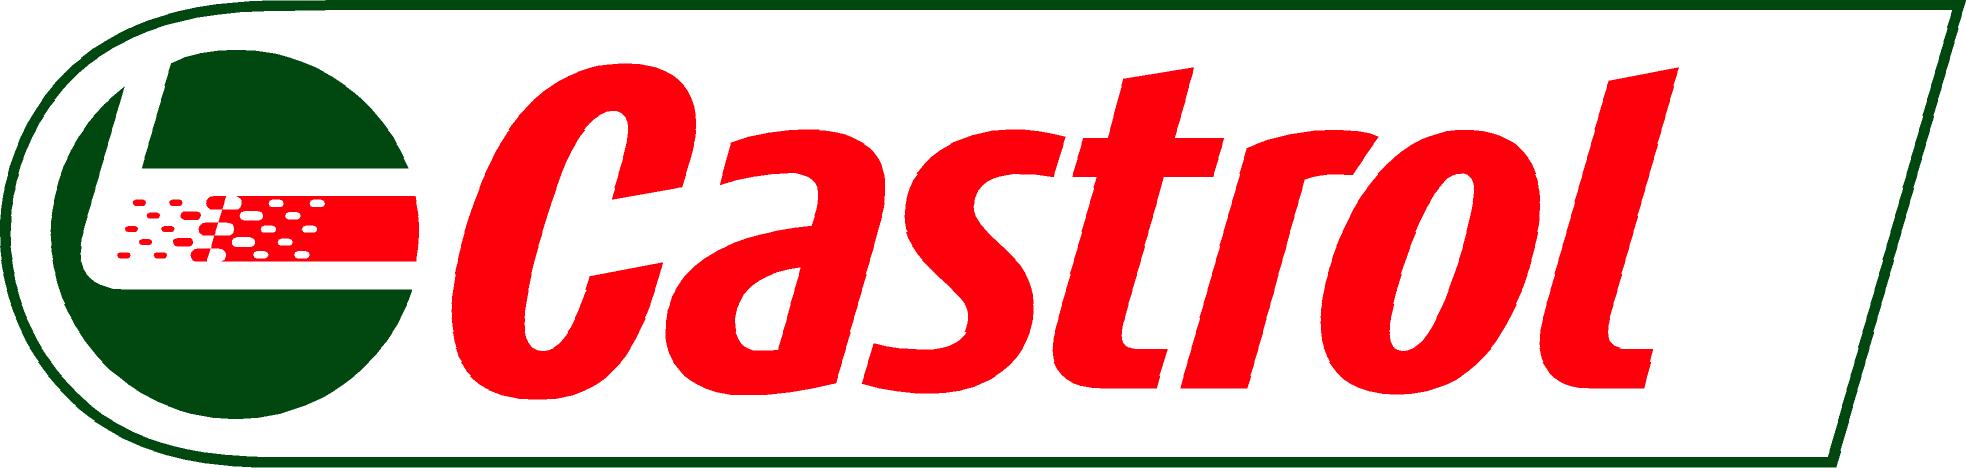 castrol_logo_big